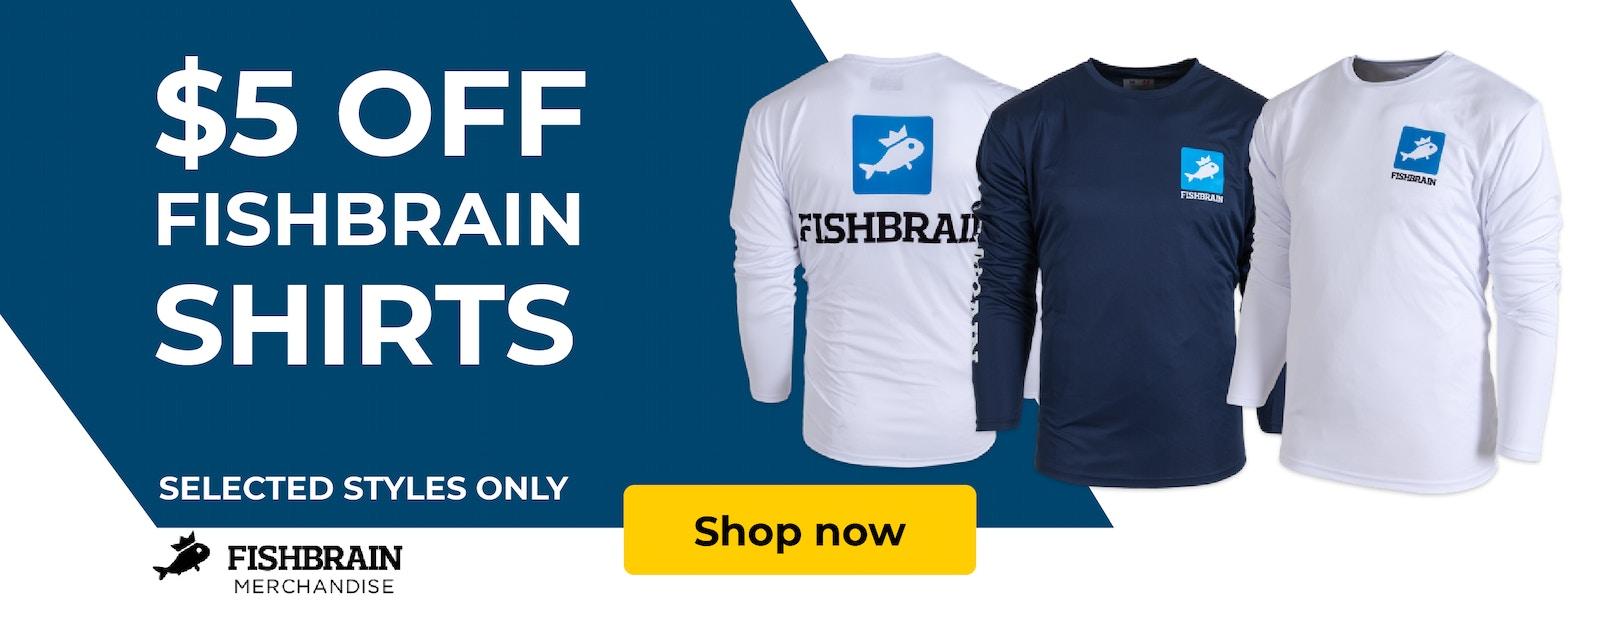 $5 OFF ALL FISHBRAIN SHIRTS